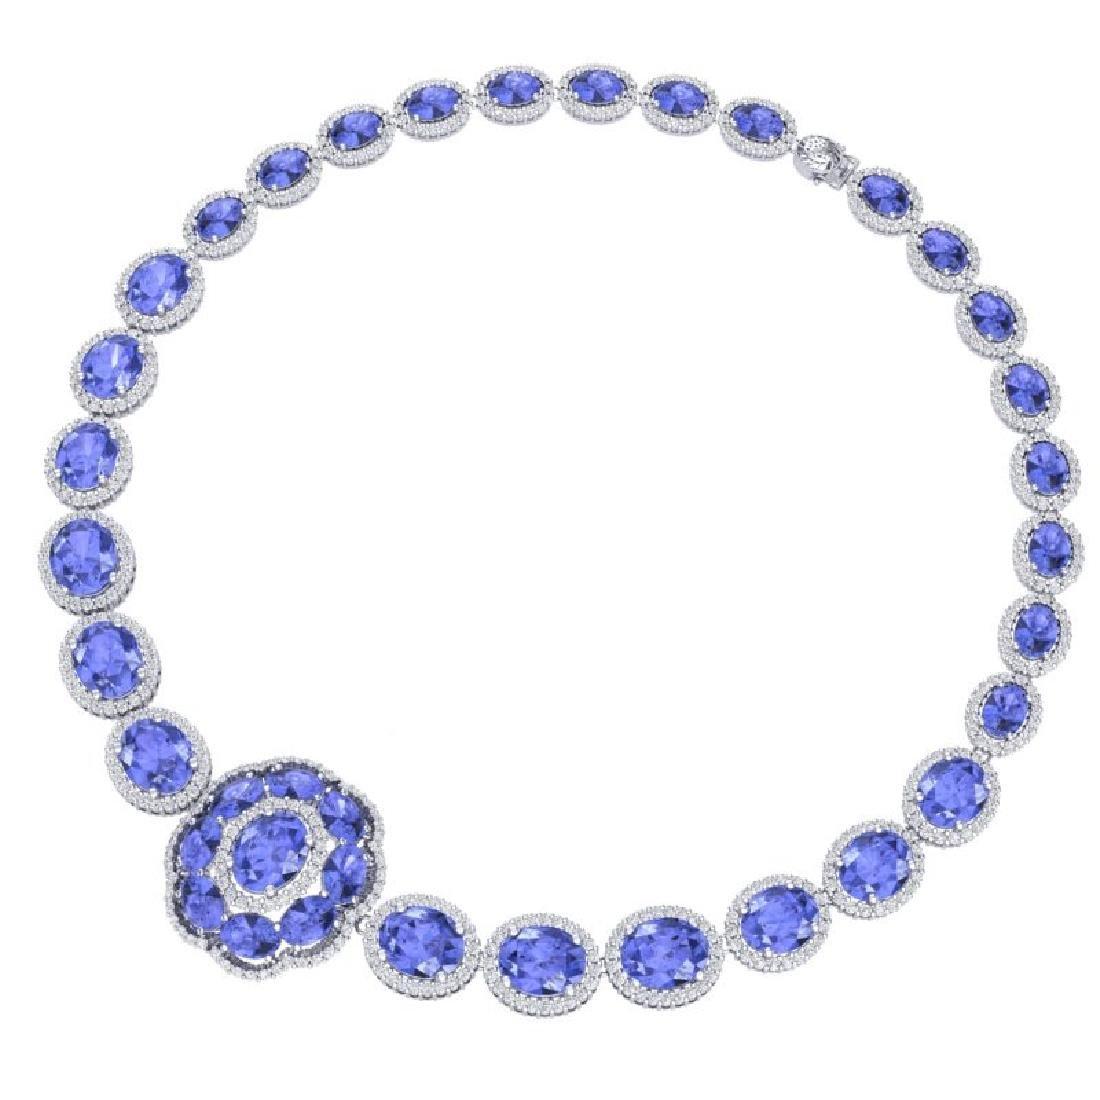 55.84 CTW Royalty Tanzanite & VS Diamond Necklace 18K - 3